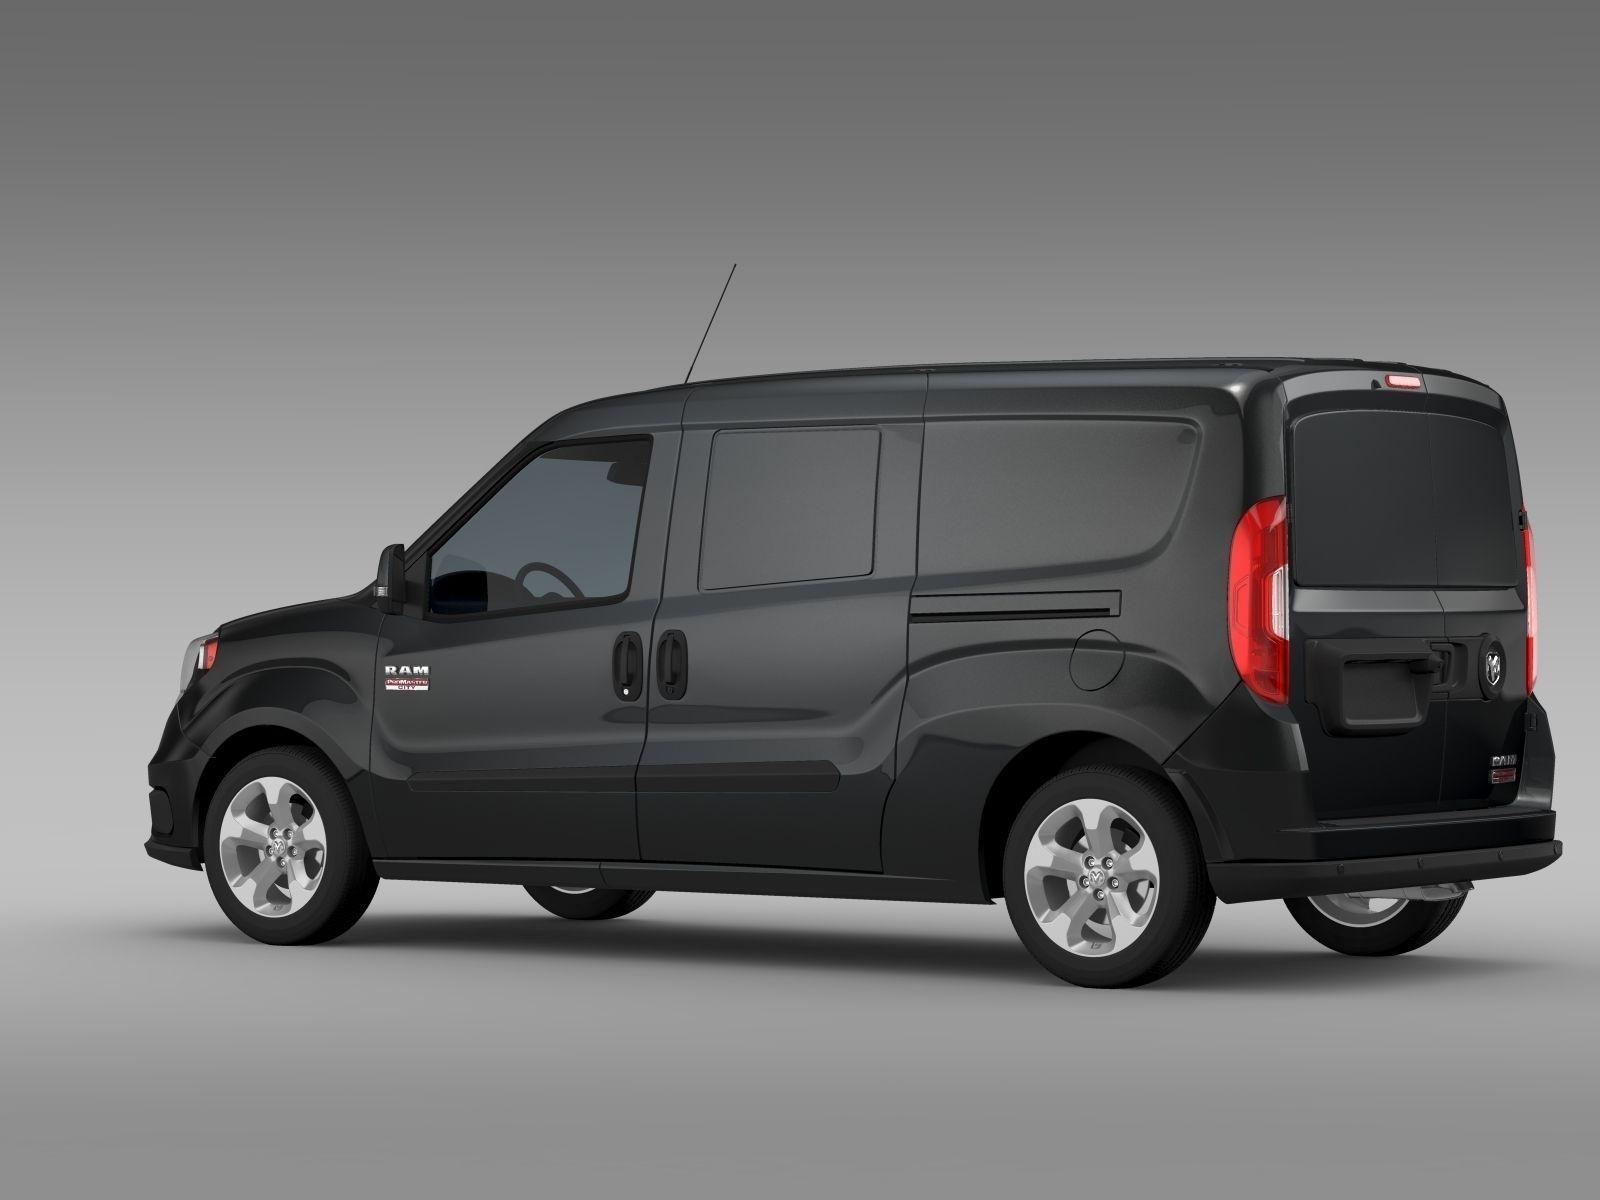 autotrader city promaster slt ram dodge quick heyman reviews spin of dan ca cargo van expert